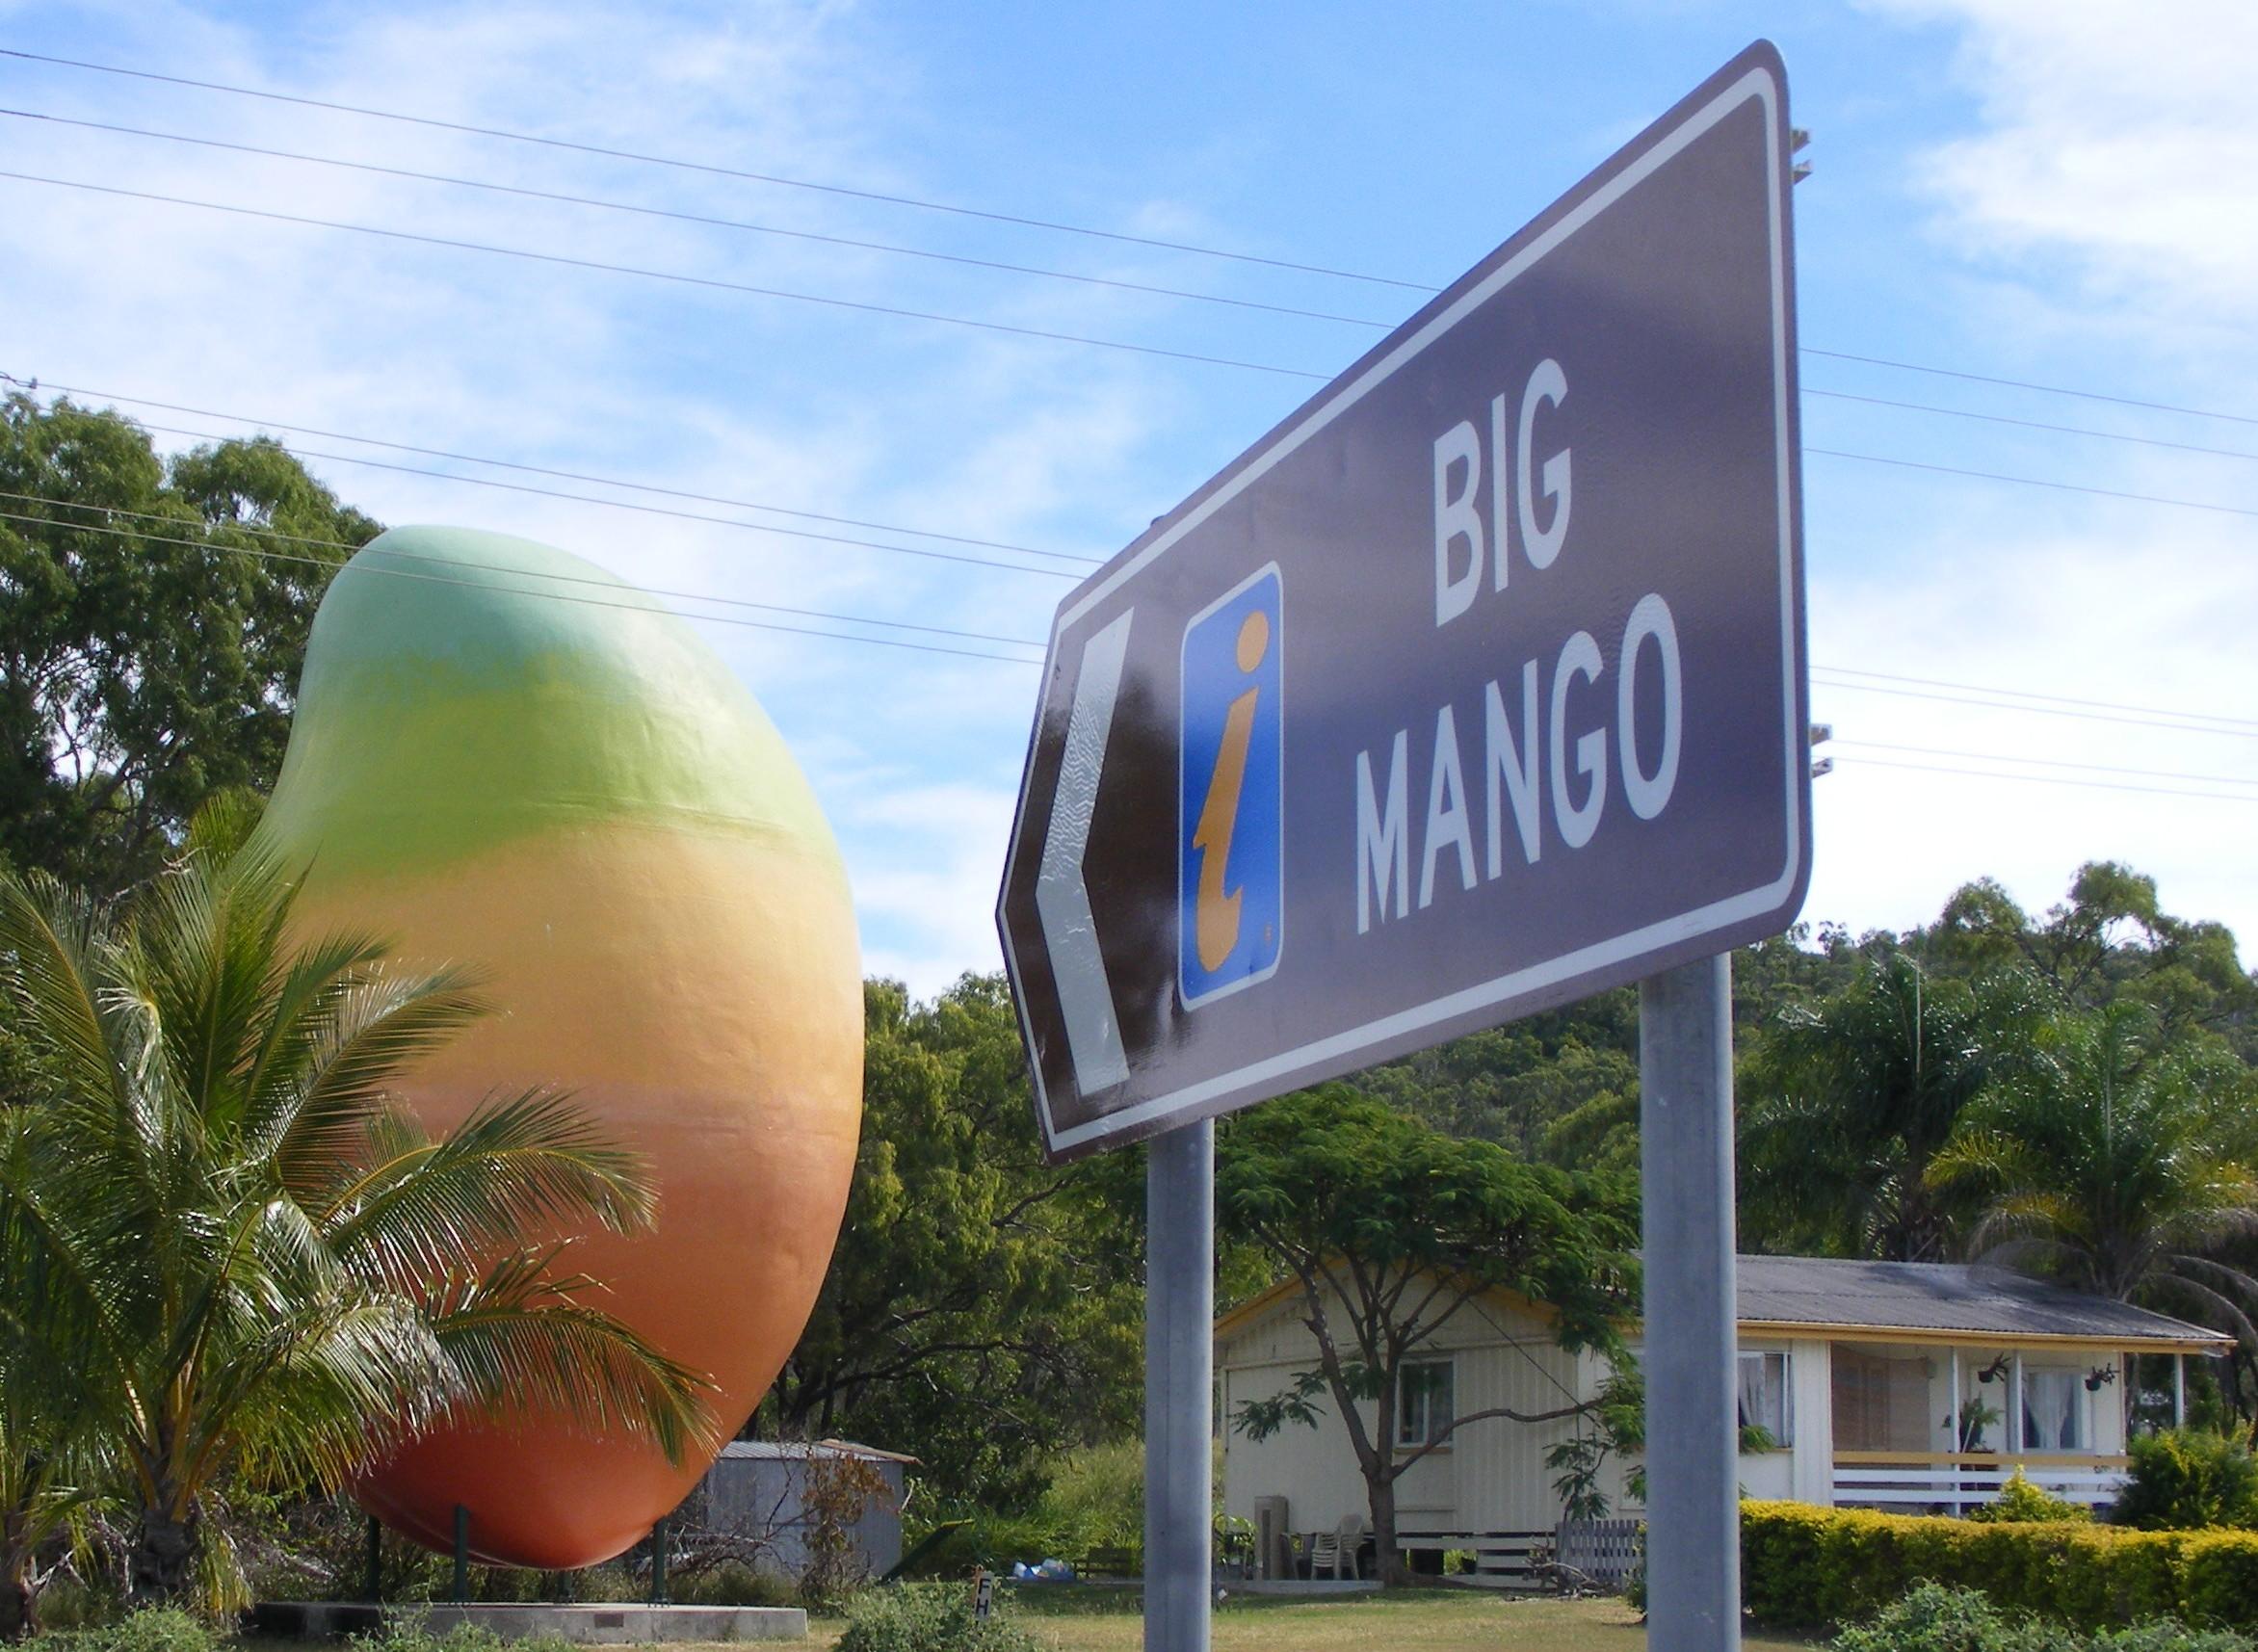 Big Mango sign